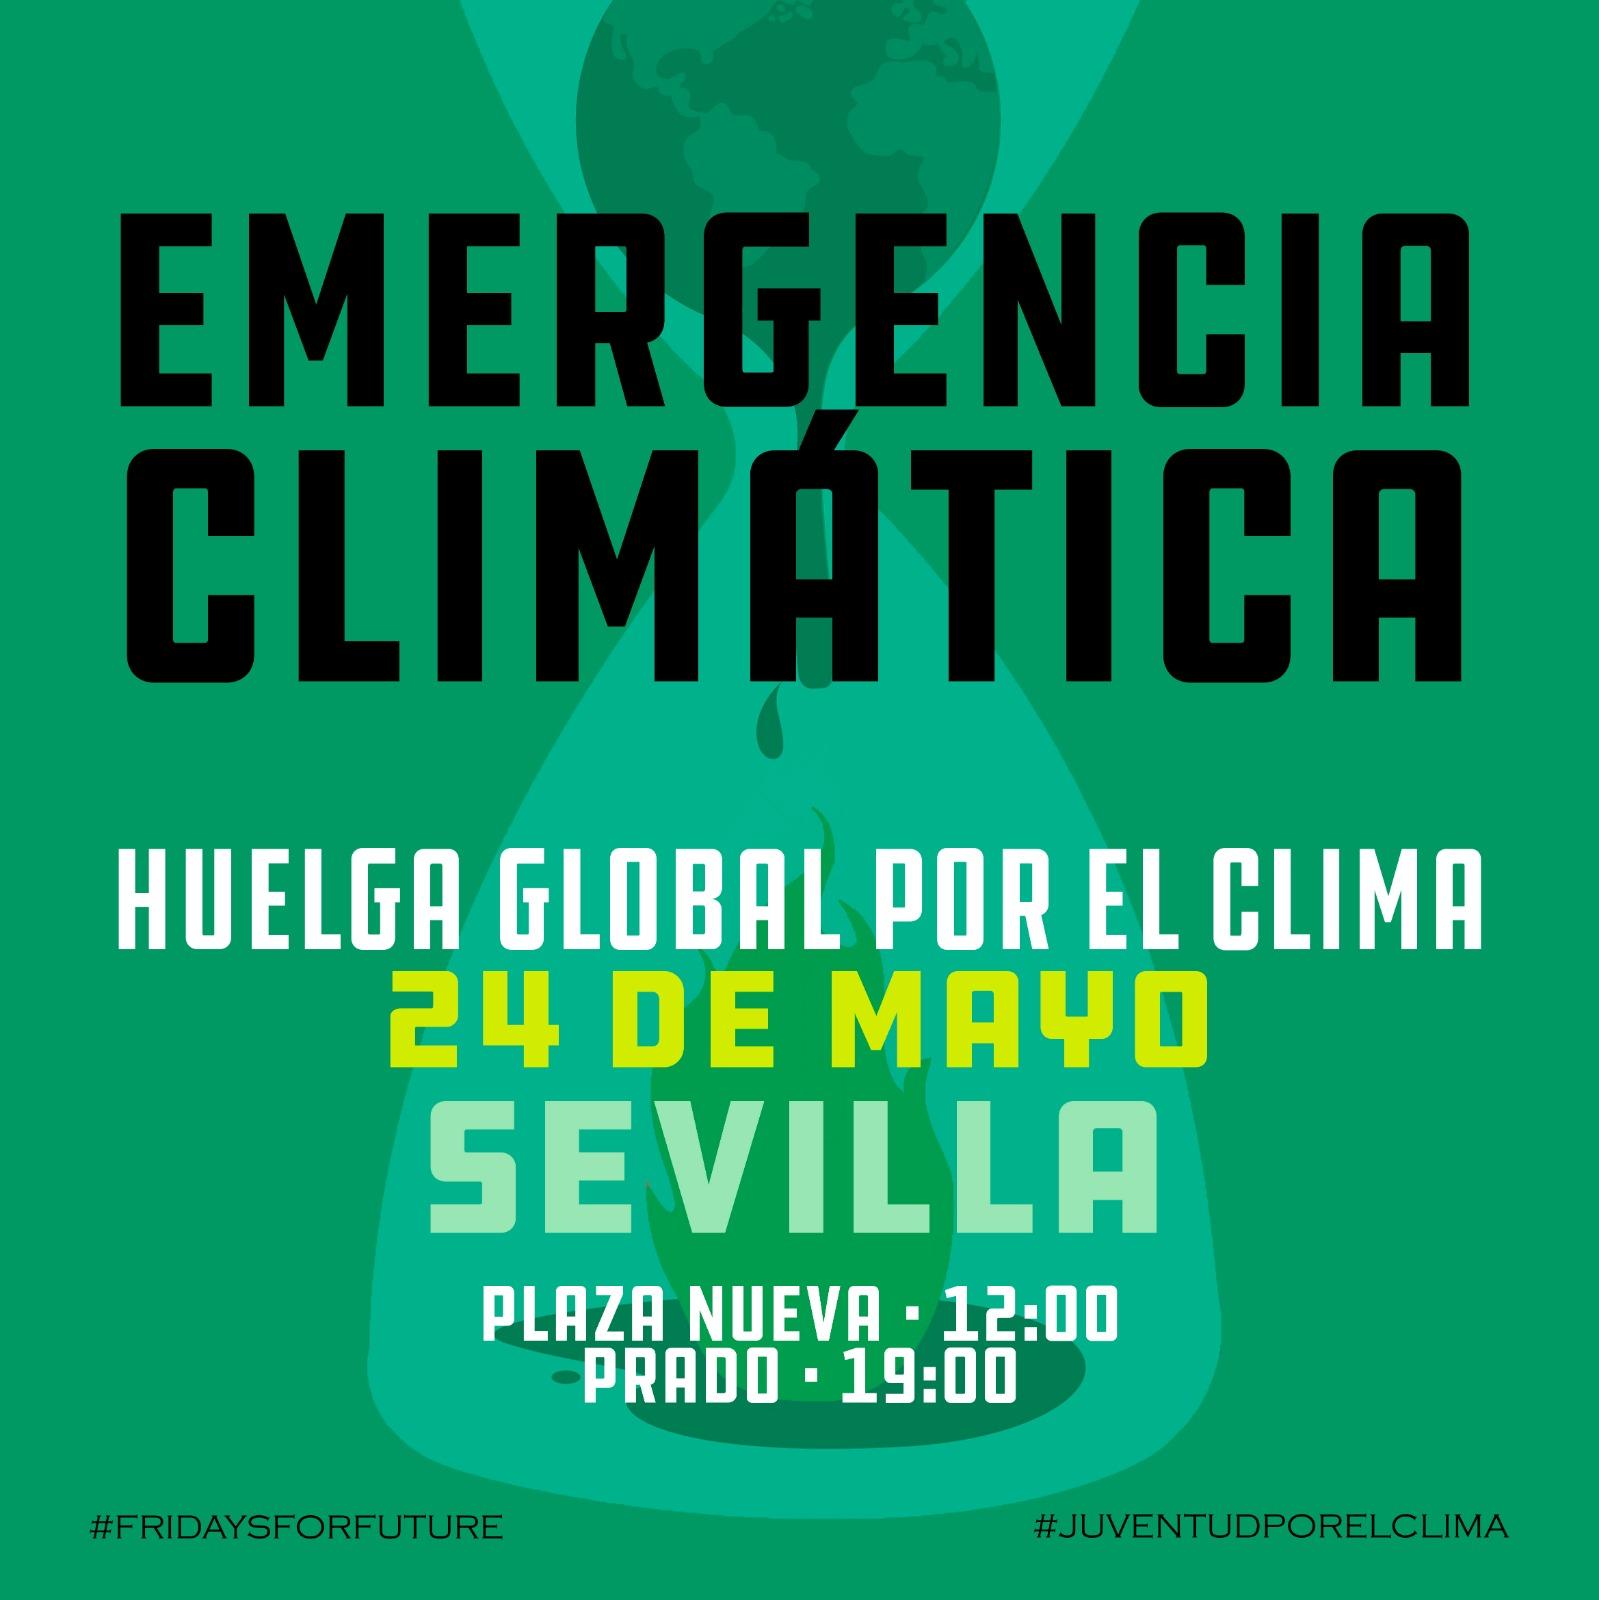 EMERGENCIA CLIMÁTICA. HUELGA GLOBAL POR EL CLIMA. 24 DE MAYO.